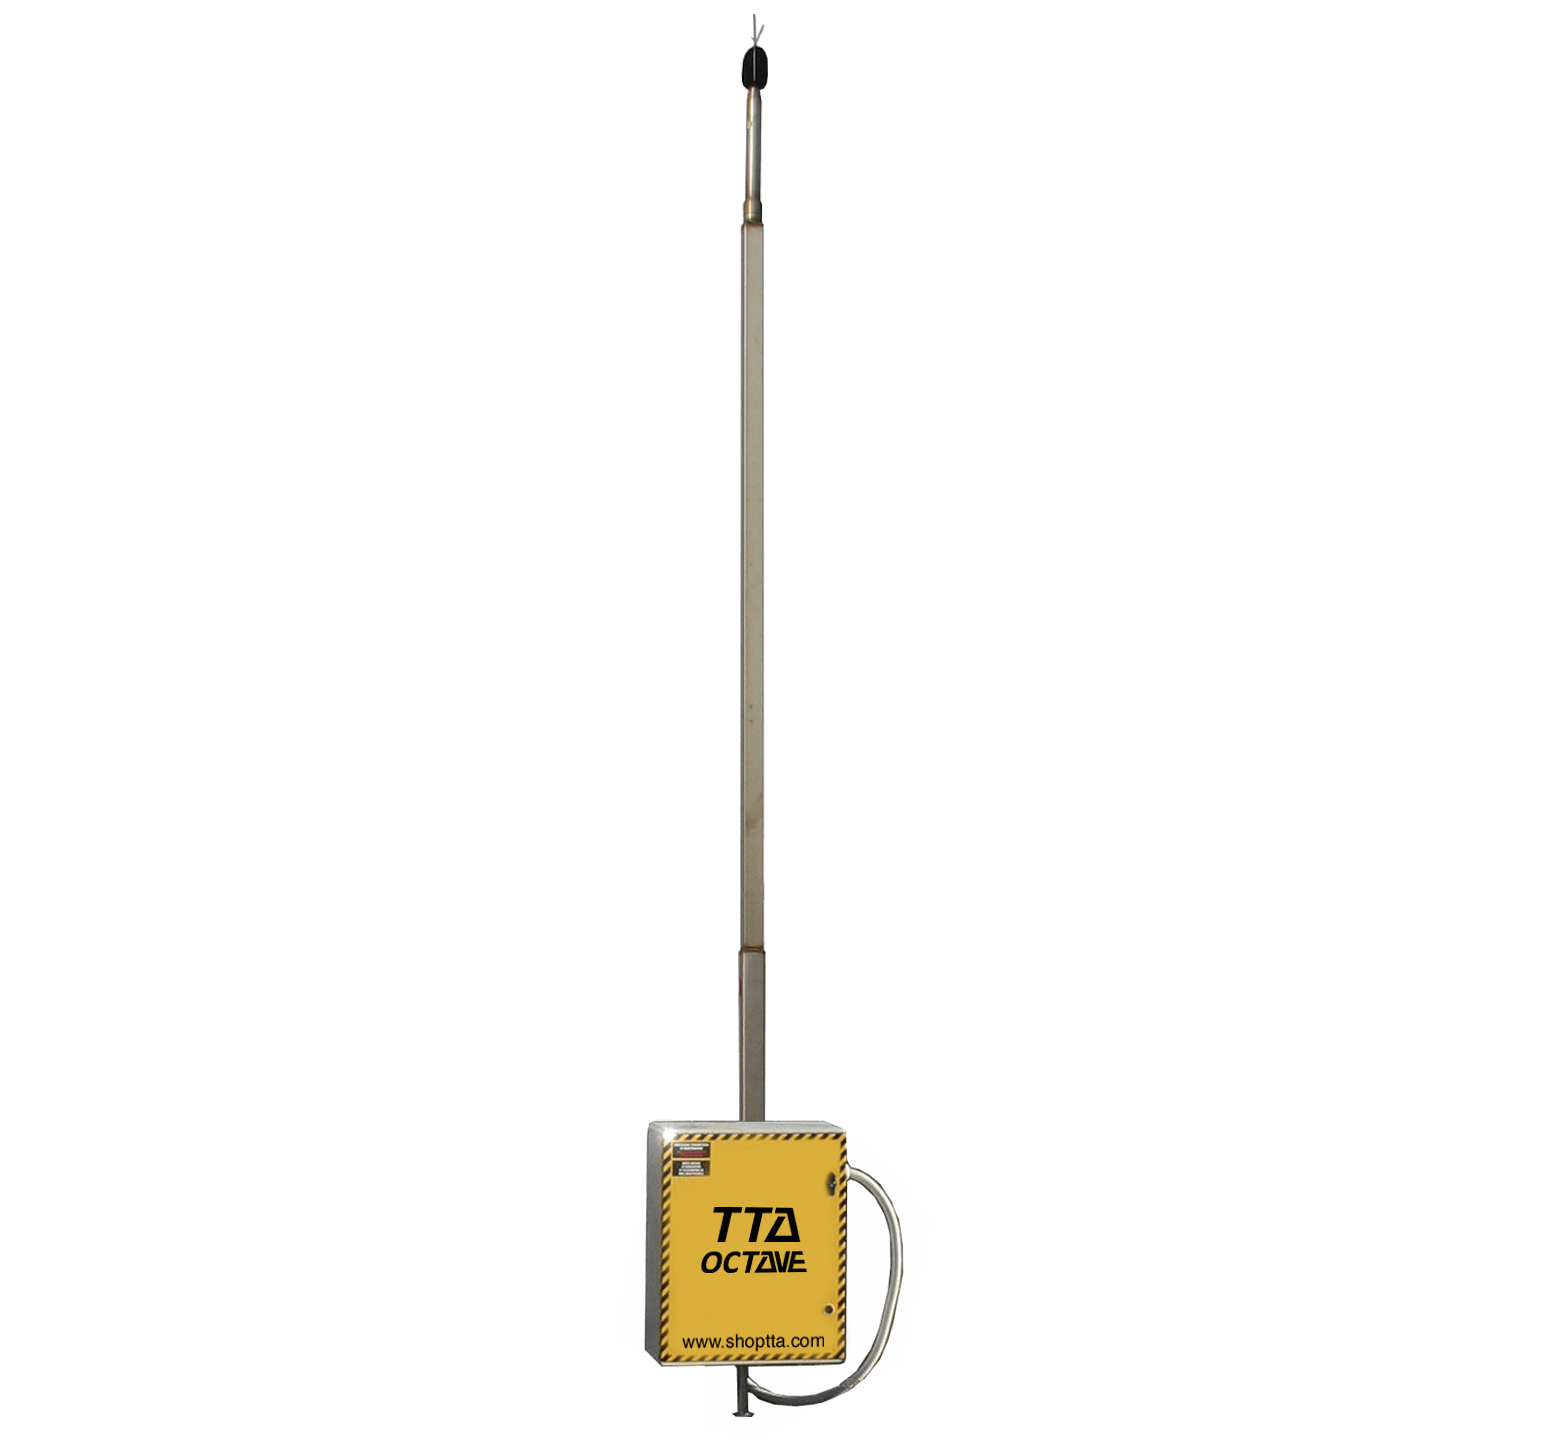 TTA Octave noise monitoring station